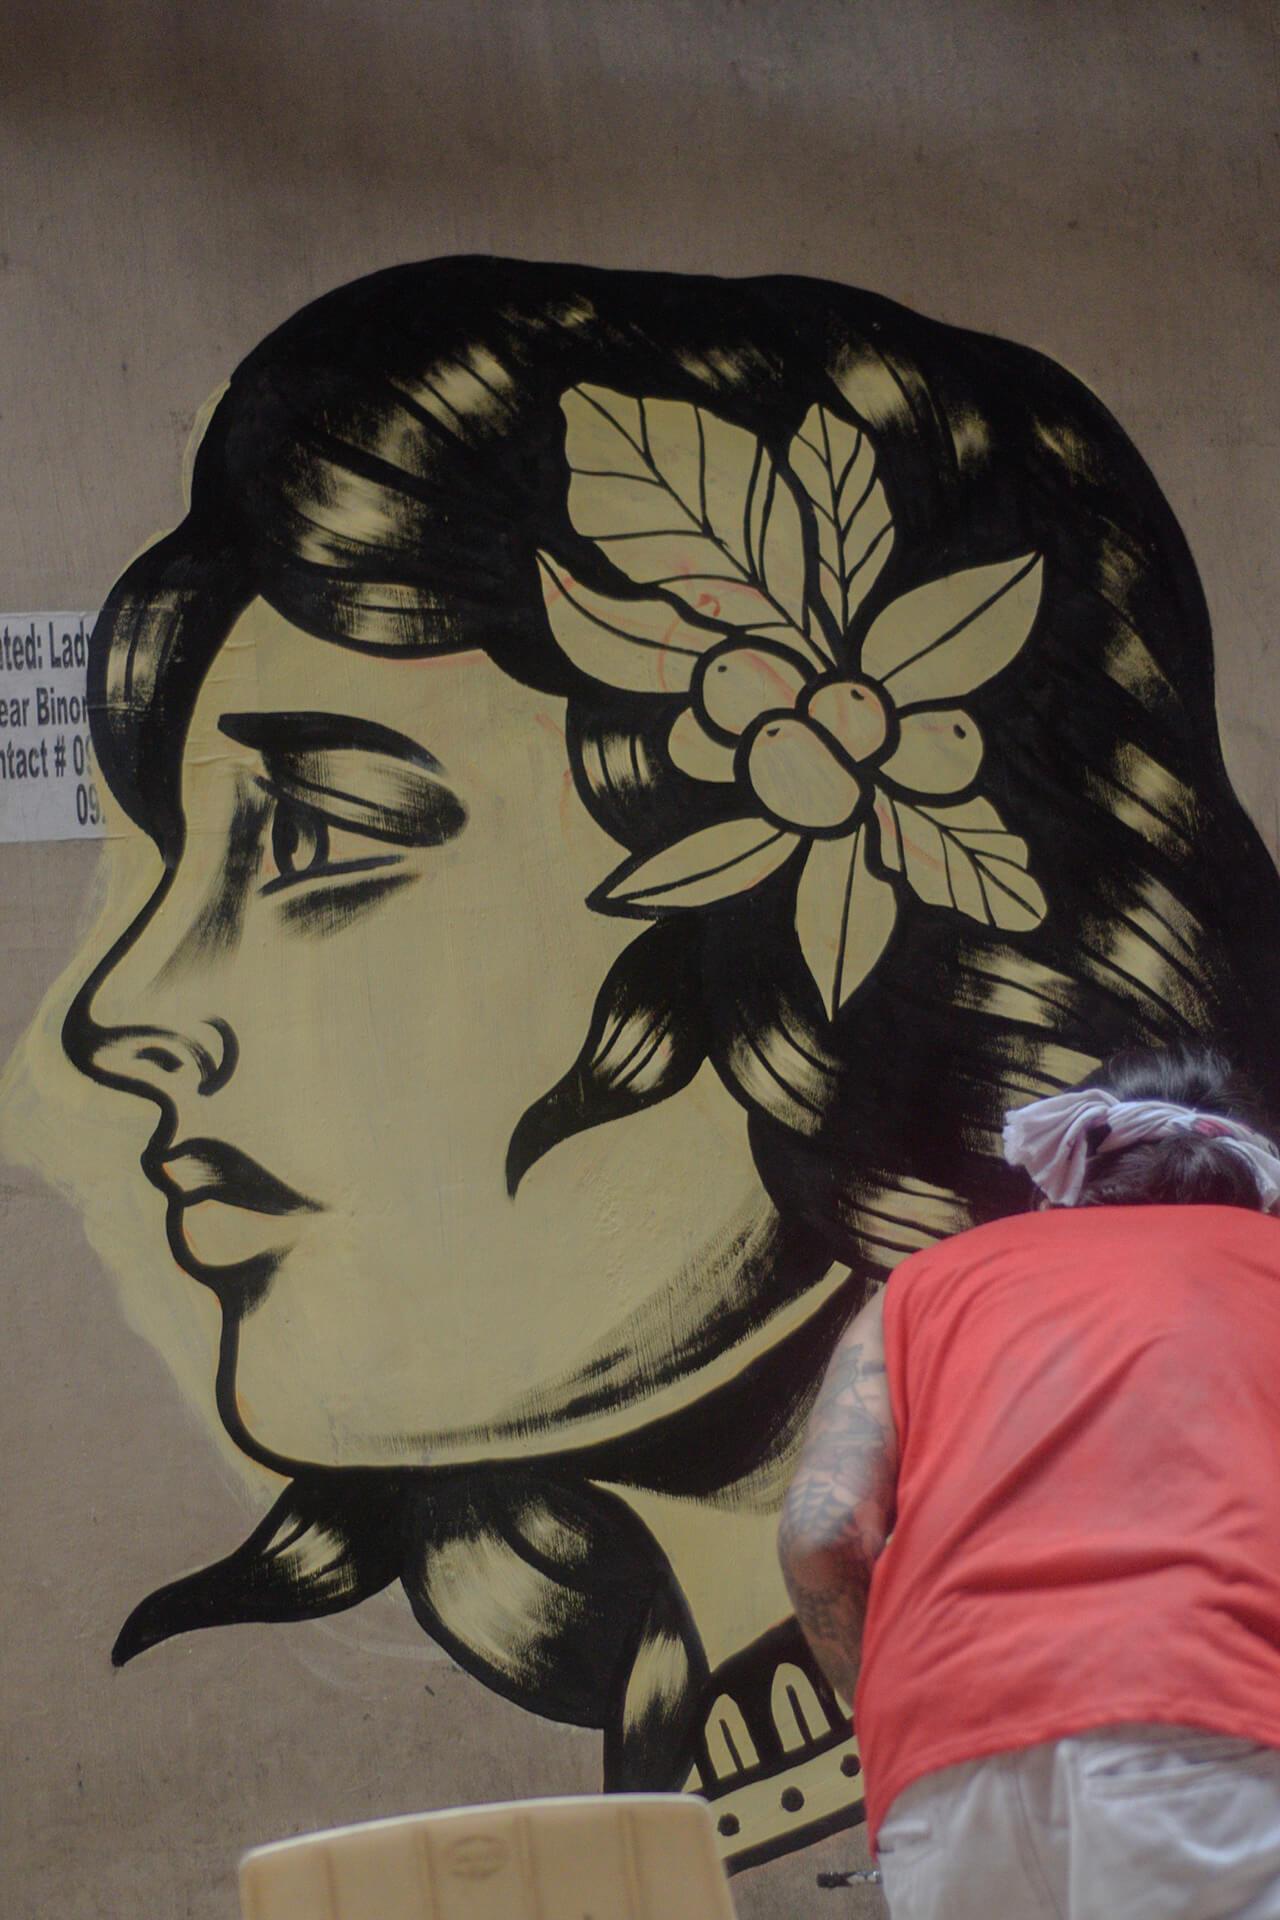 A mural painted along Carvajal Street